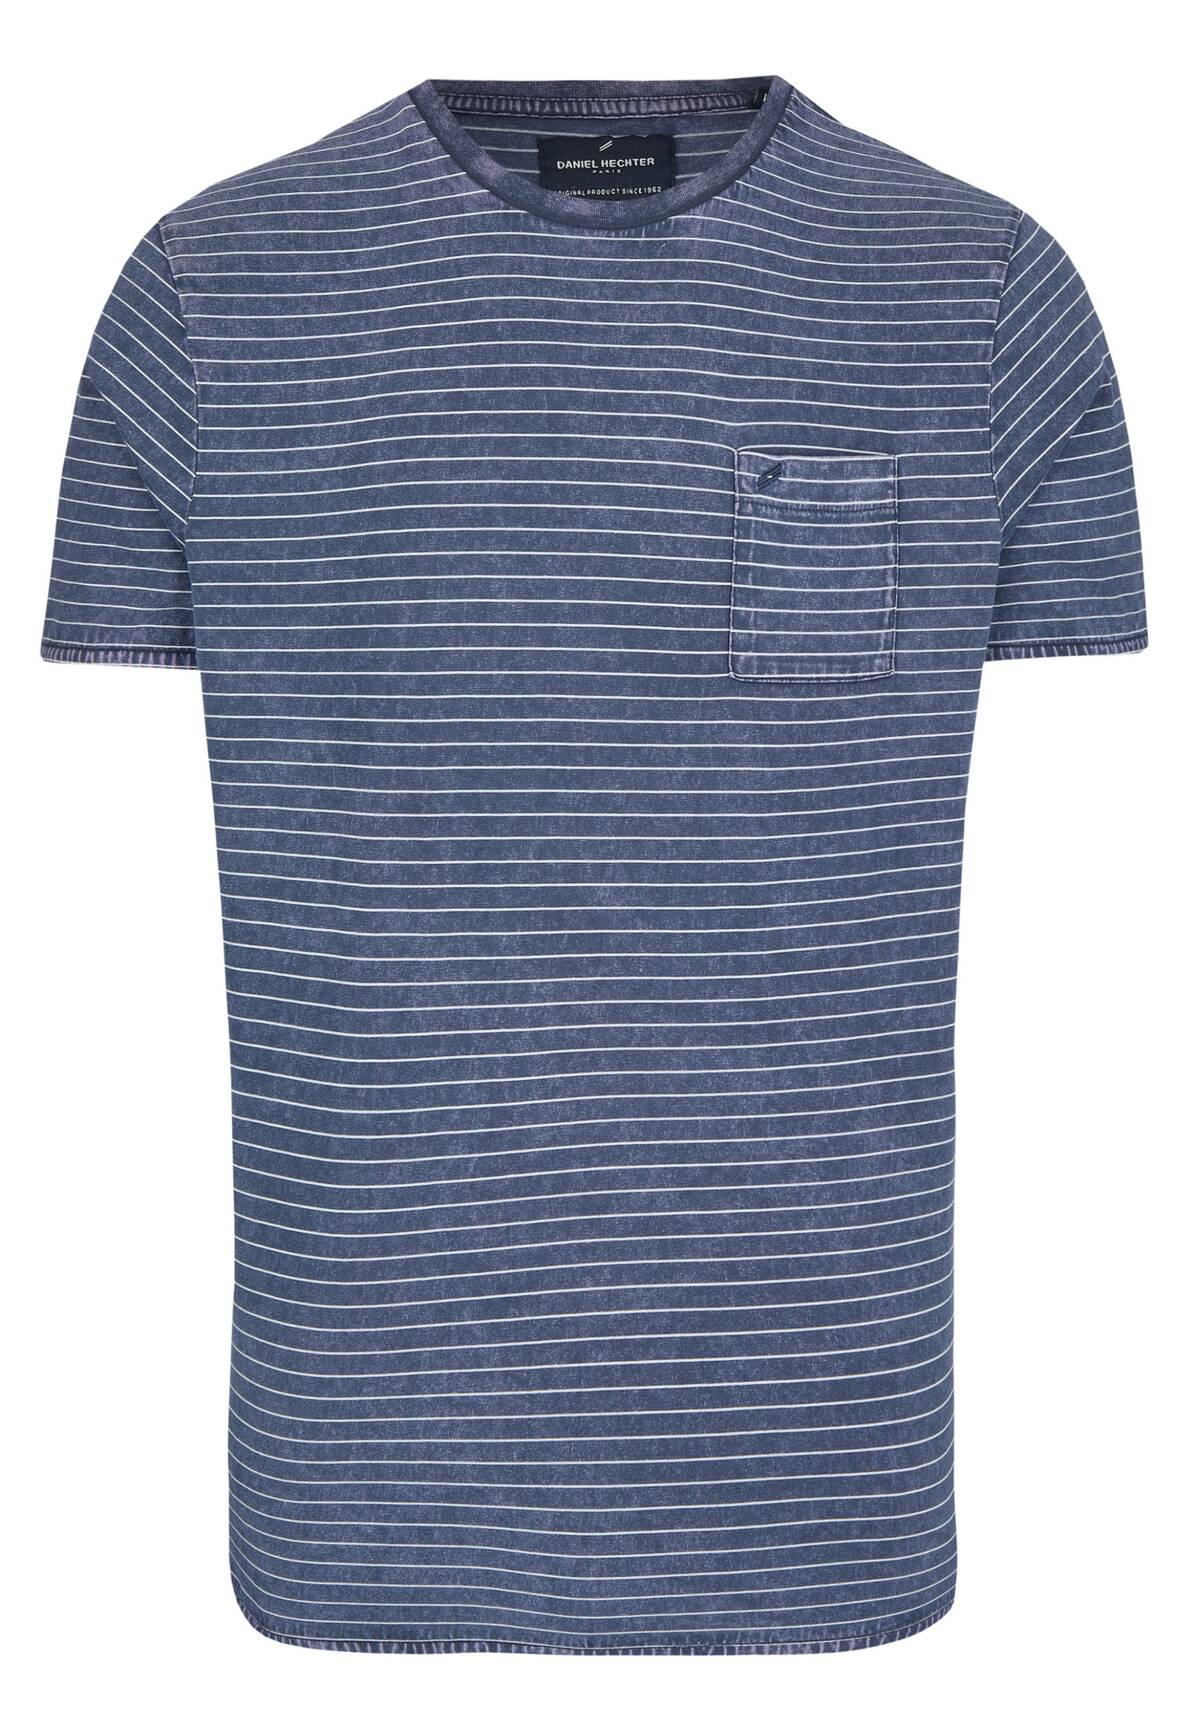 Indigo Style T-Shirt / TSHIRT